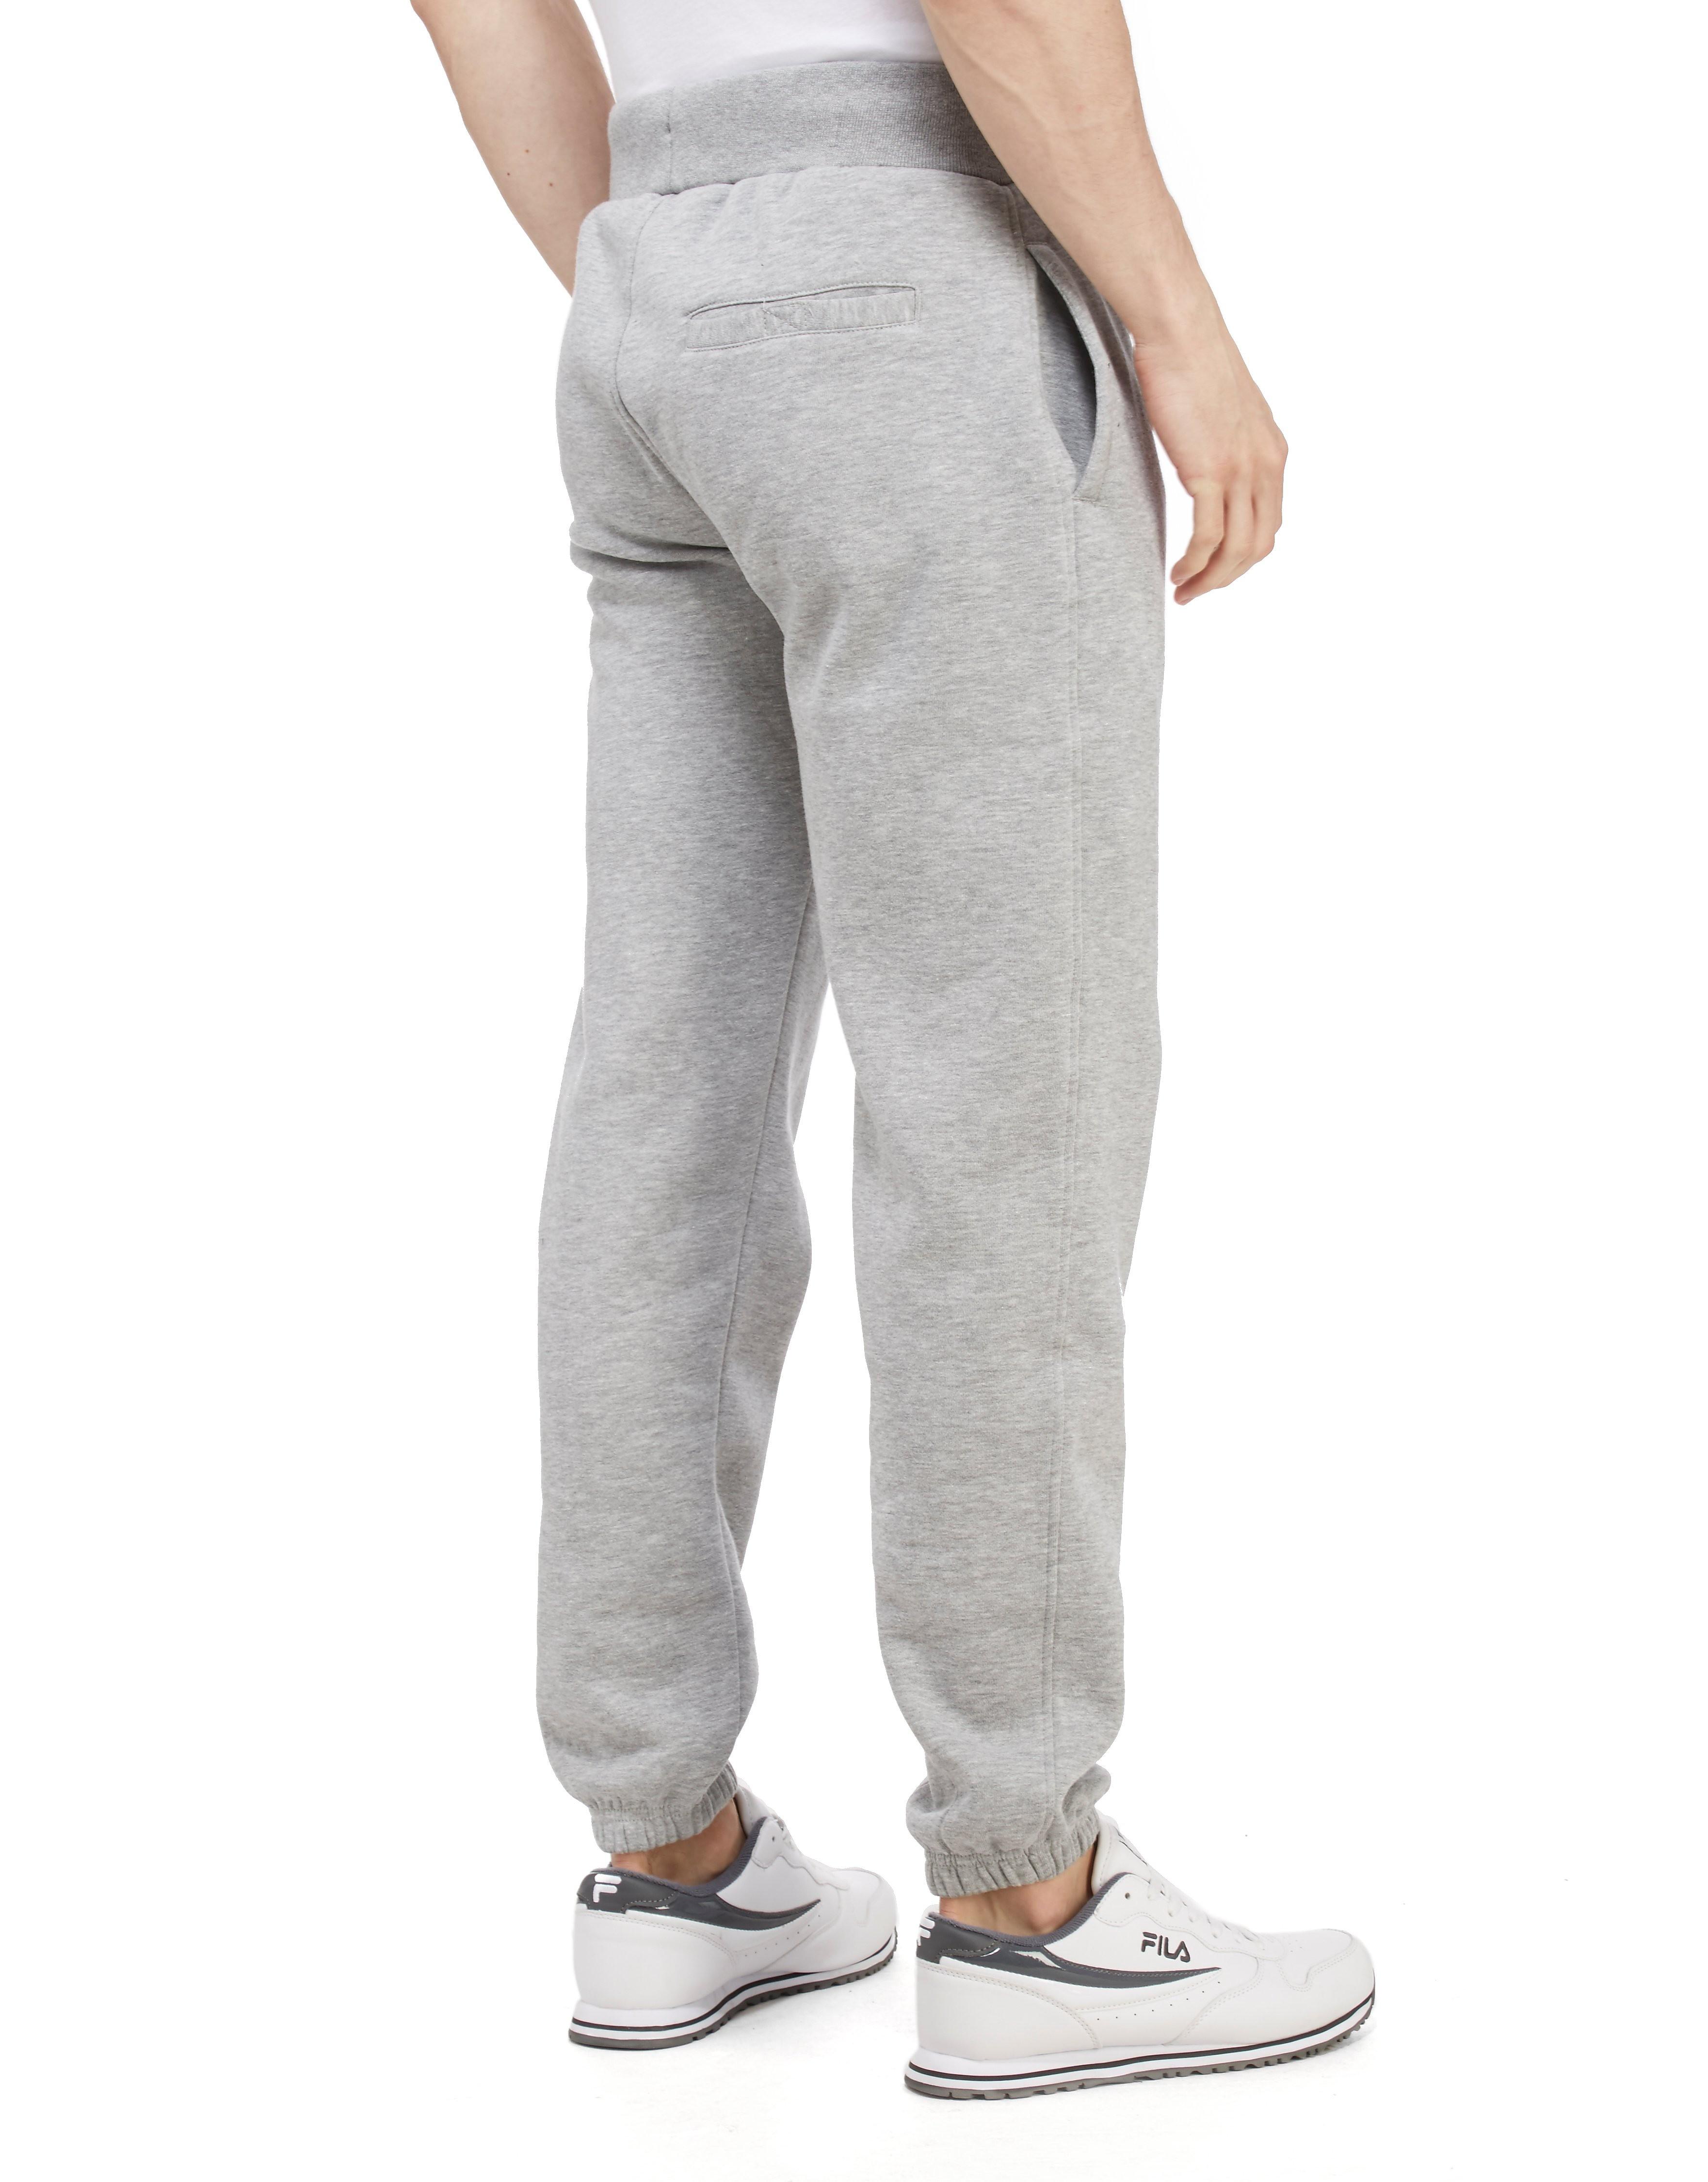 Fila Erlacher Fleece Pants